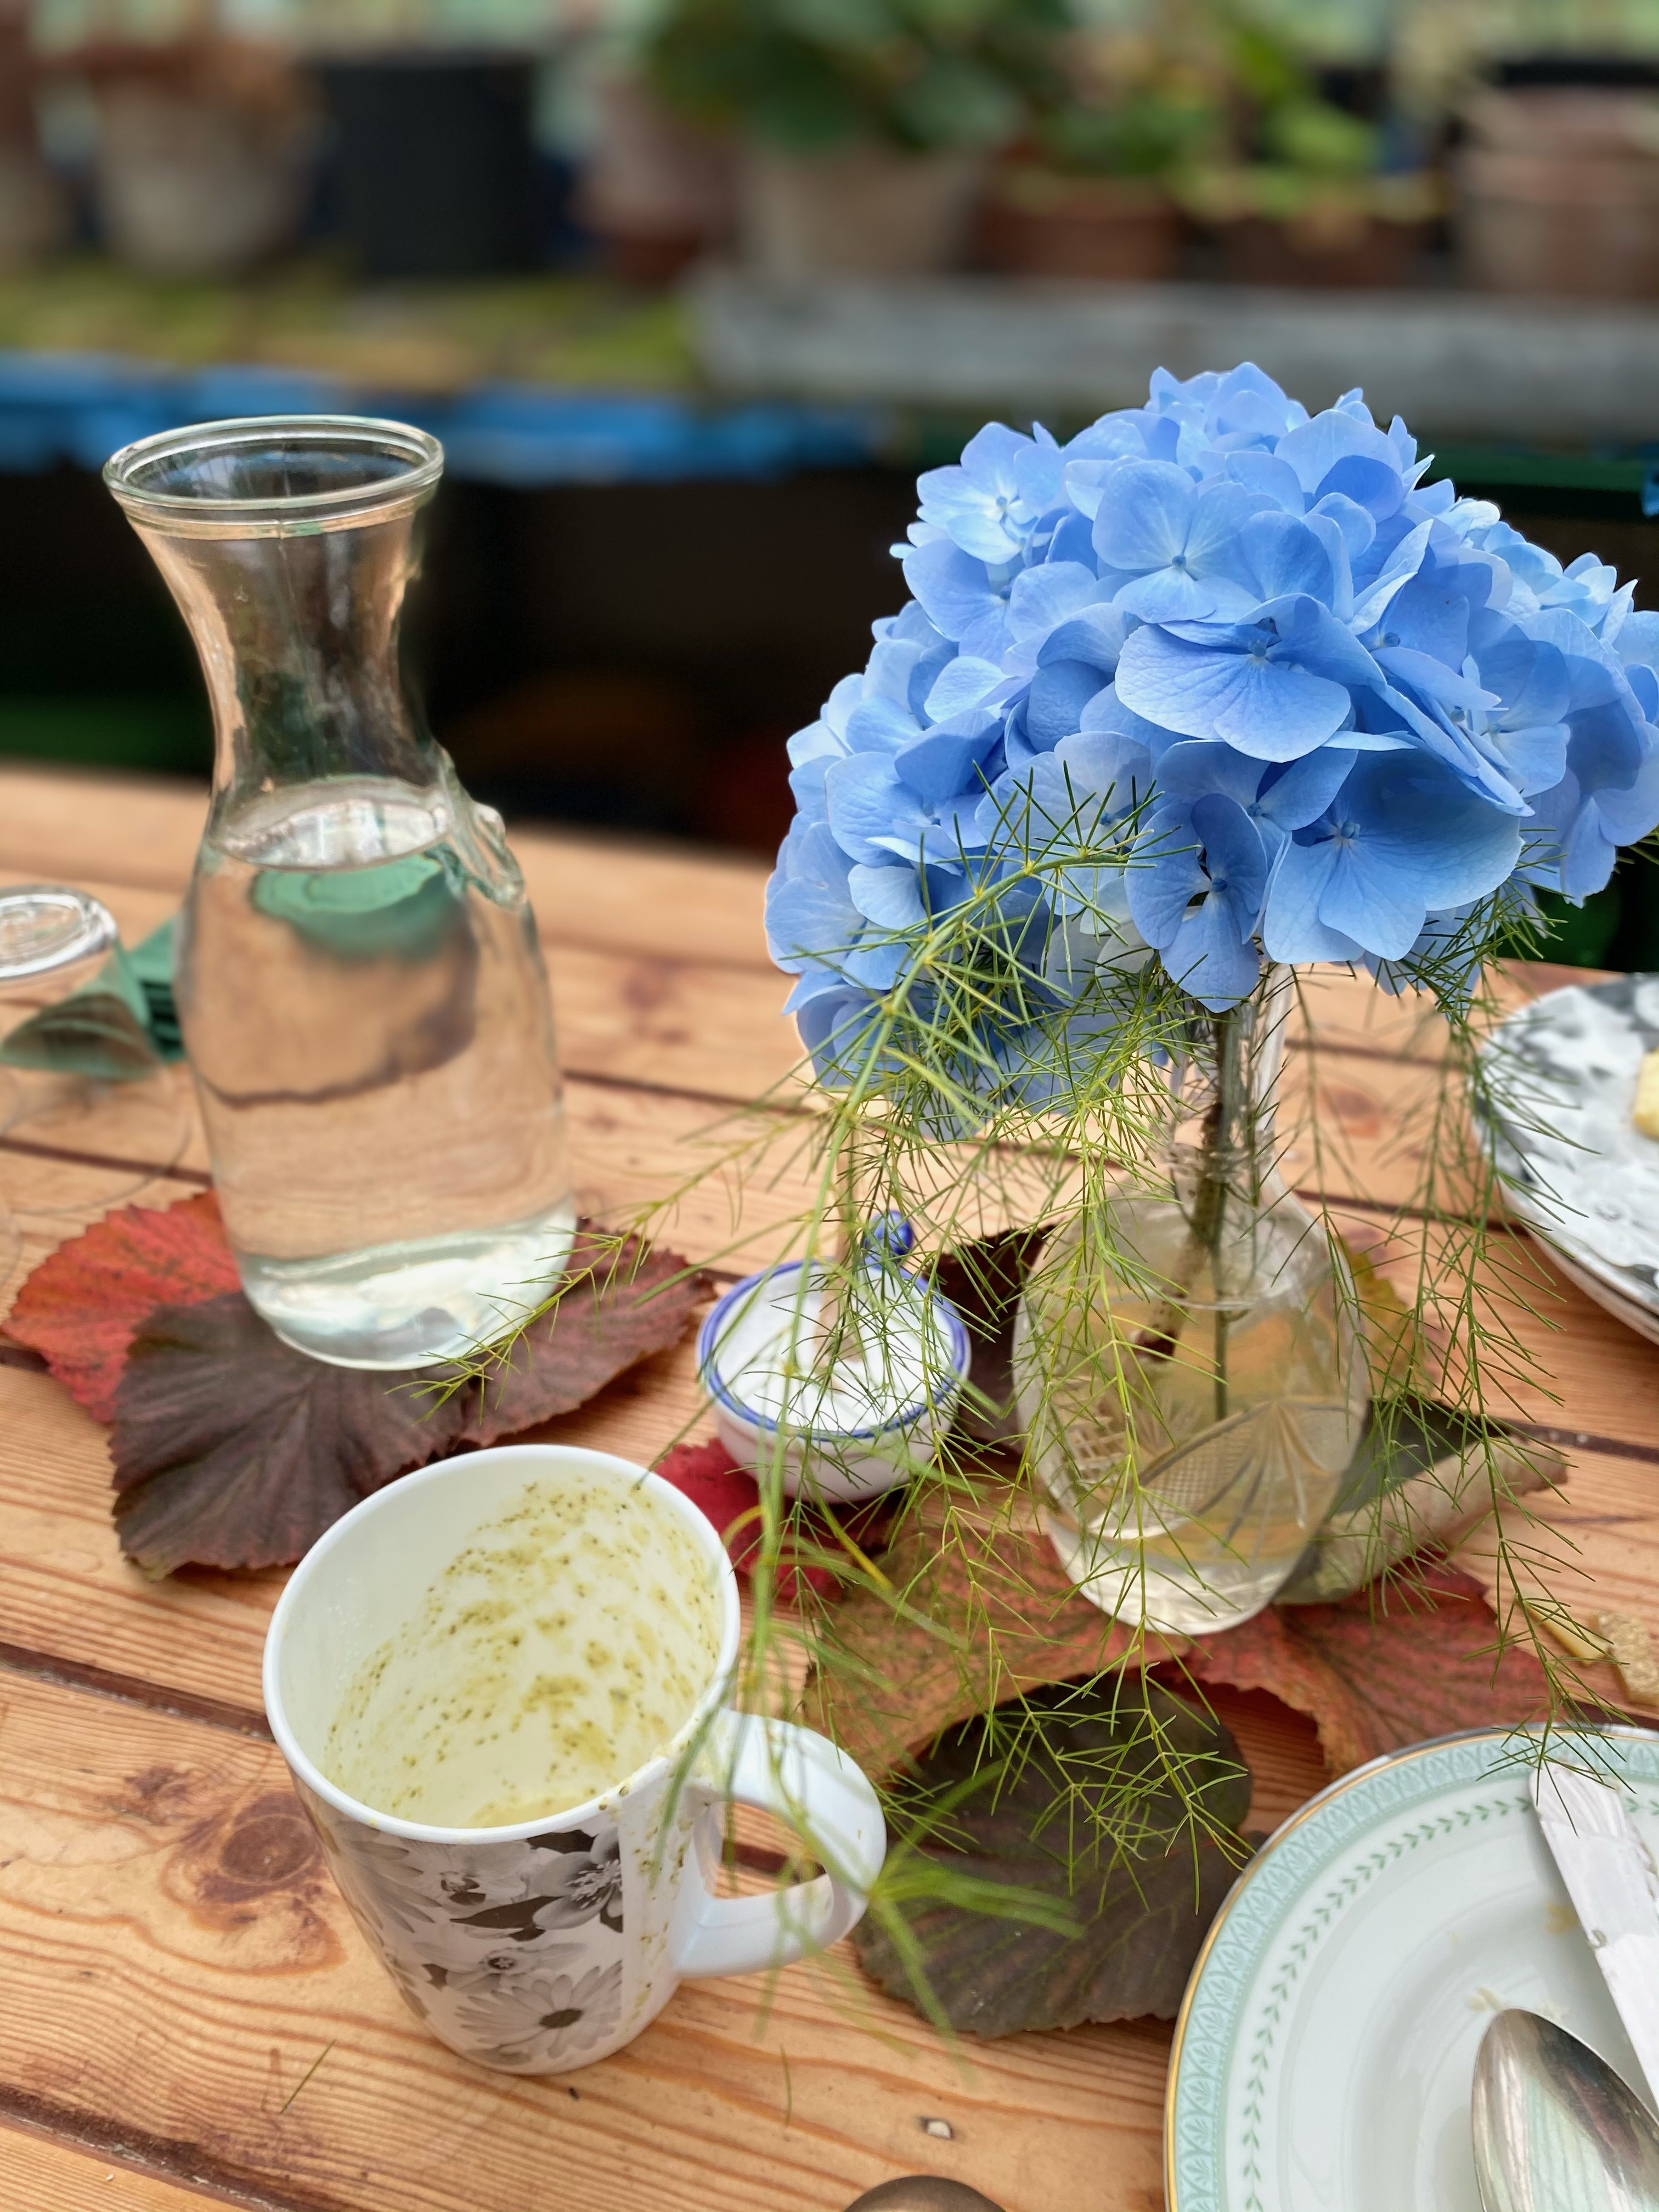 Hydrangea in the greenhouse at Hidden Huntley